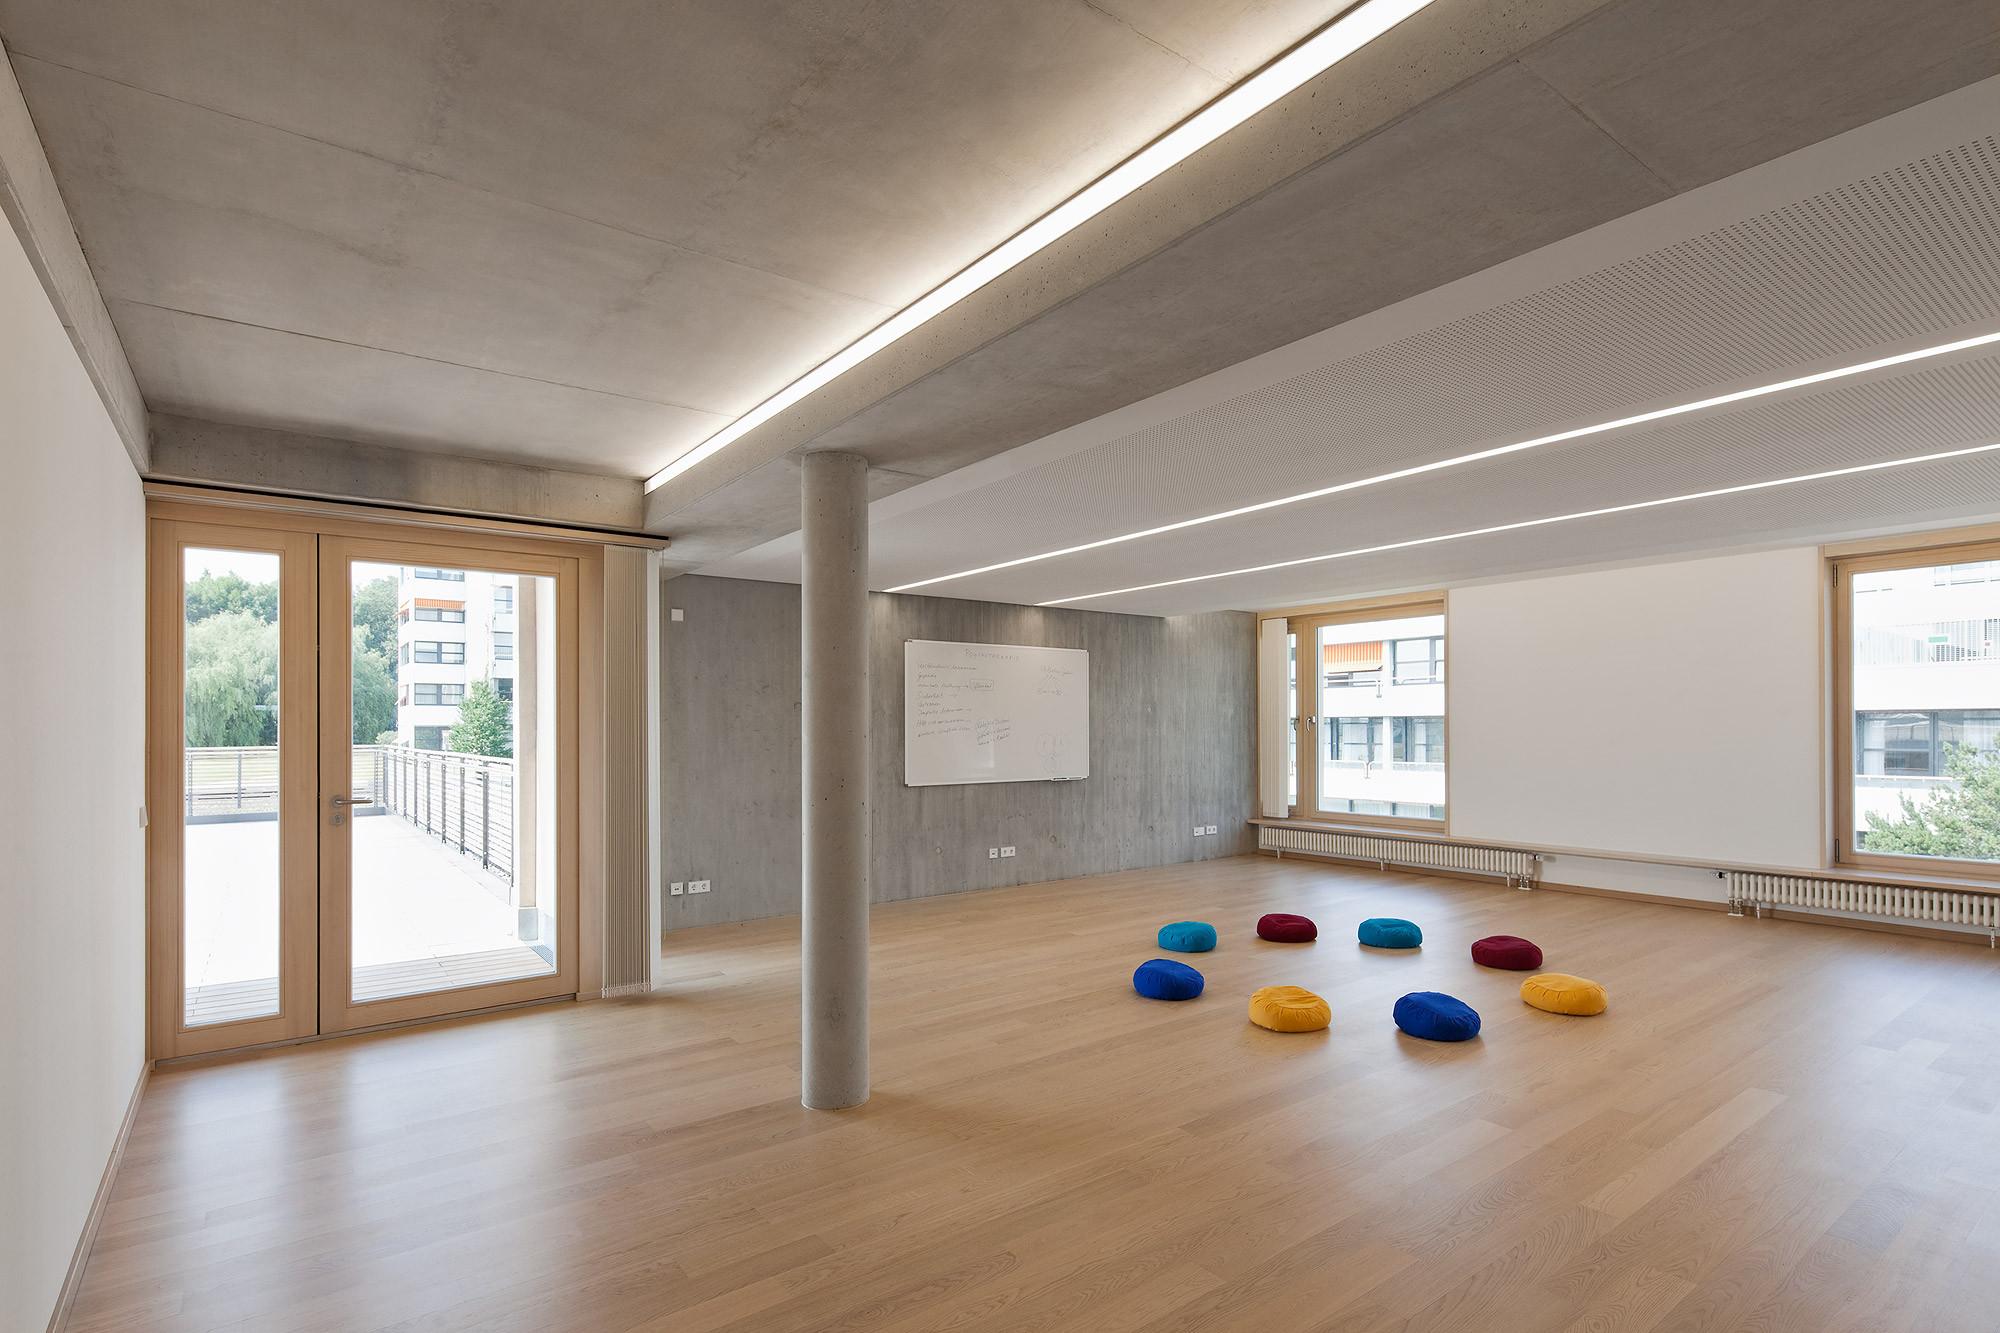 galeria centro psiqui trico friedrichshafen huber. Black Bedroom Furniture Sets. Home Design Ideas